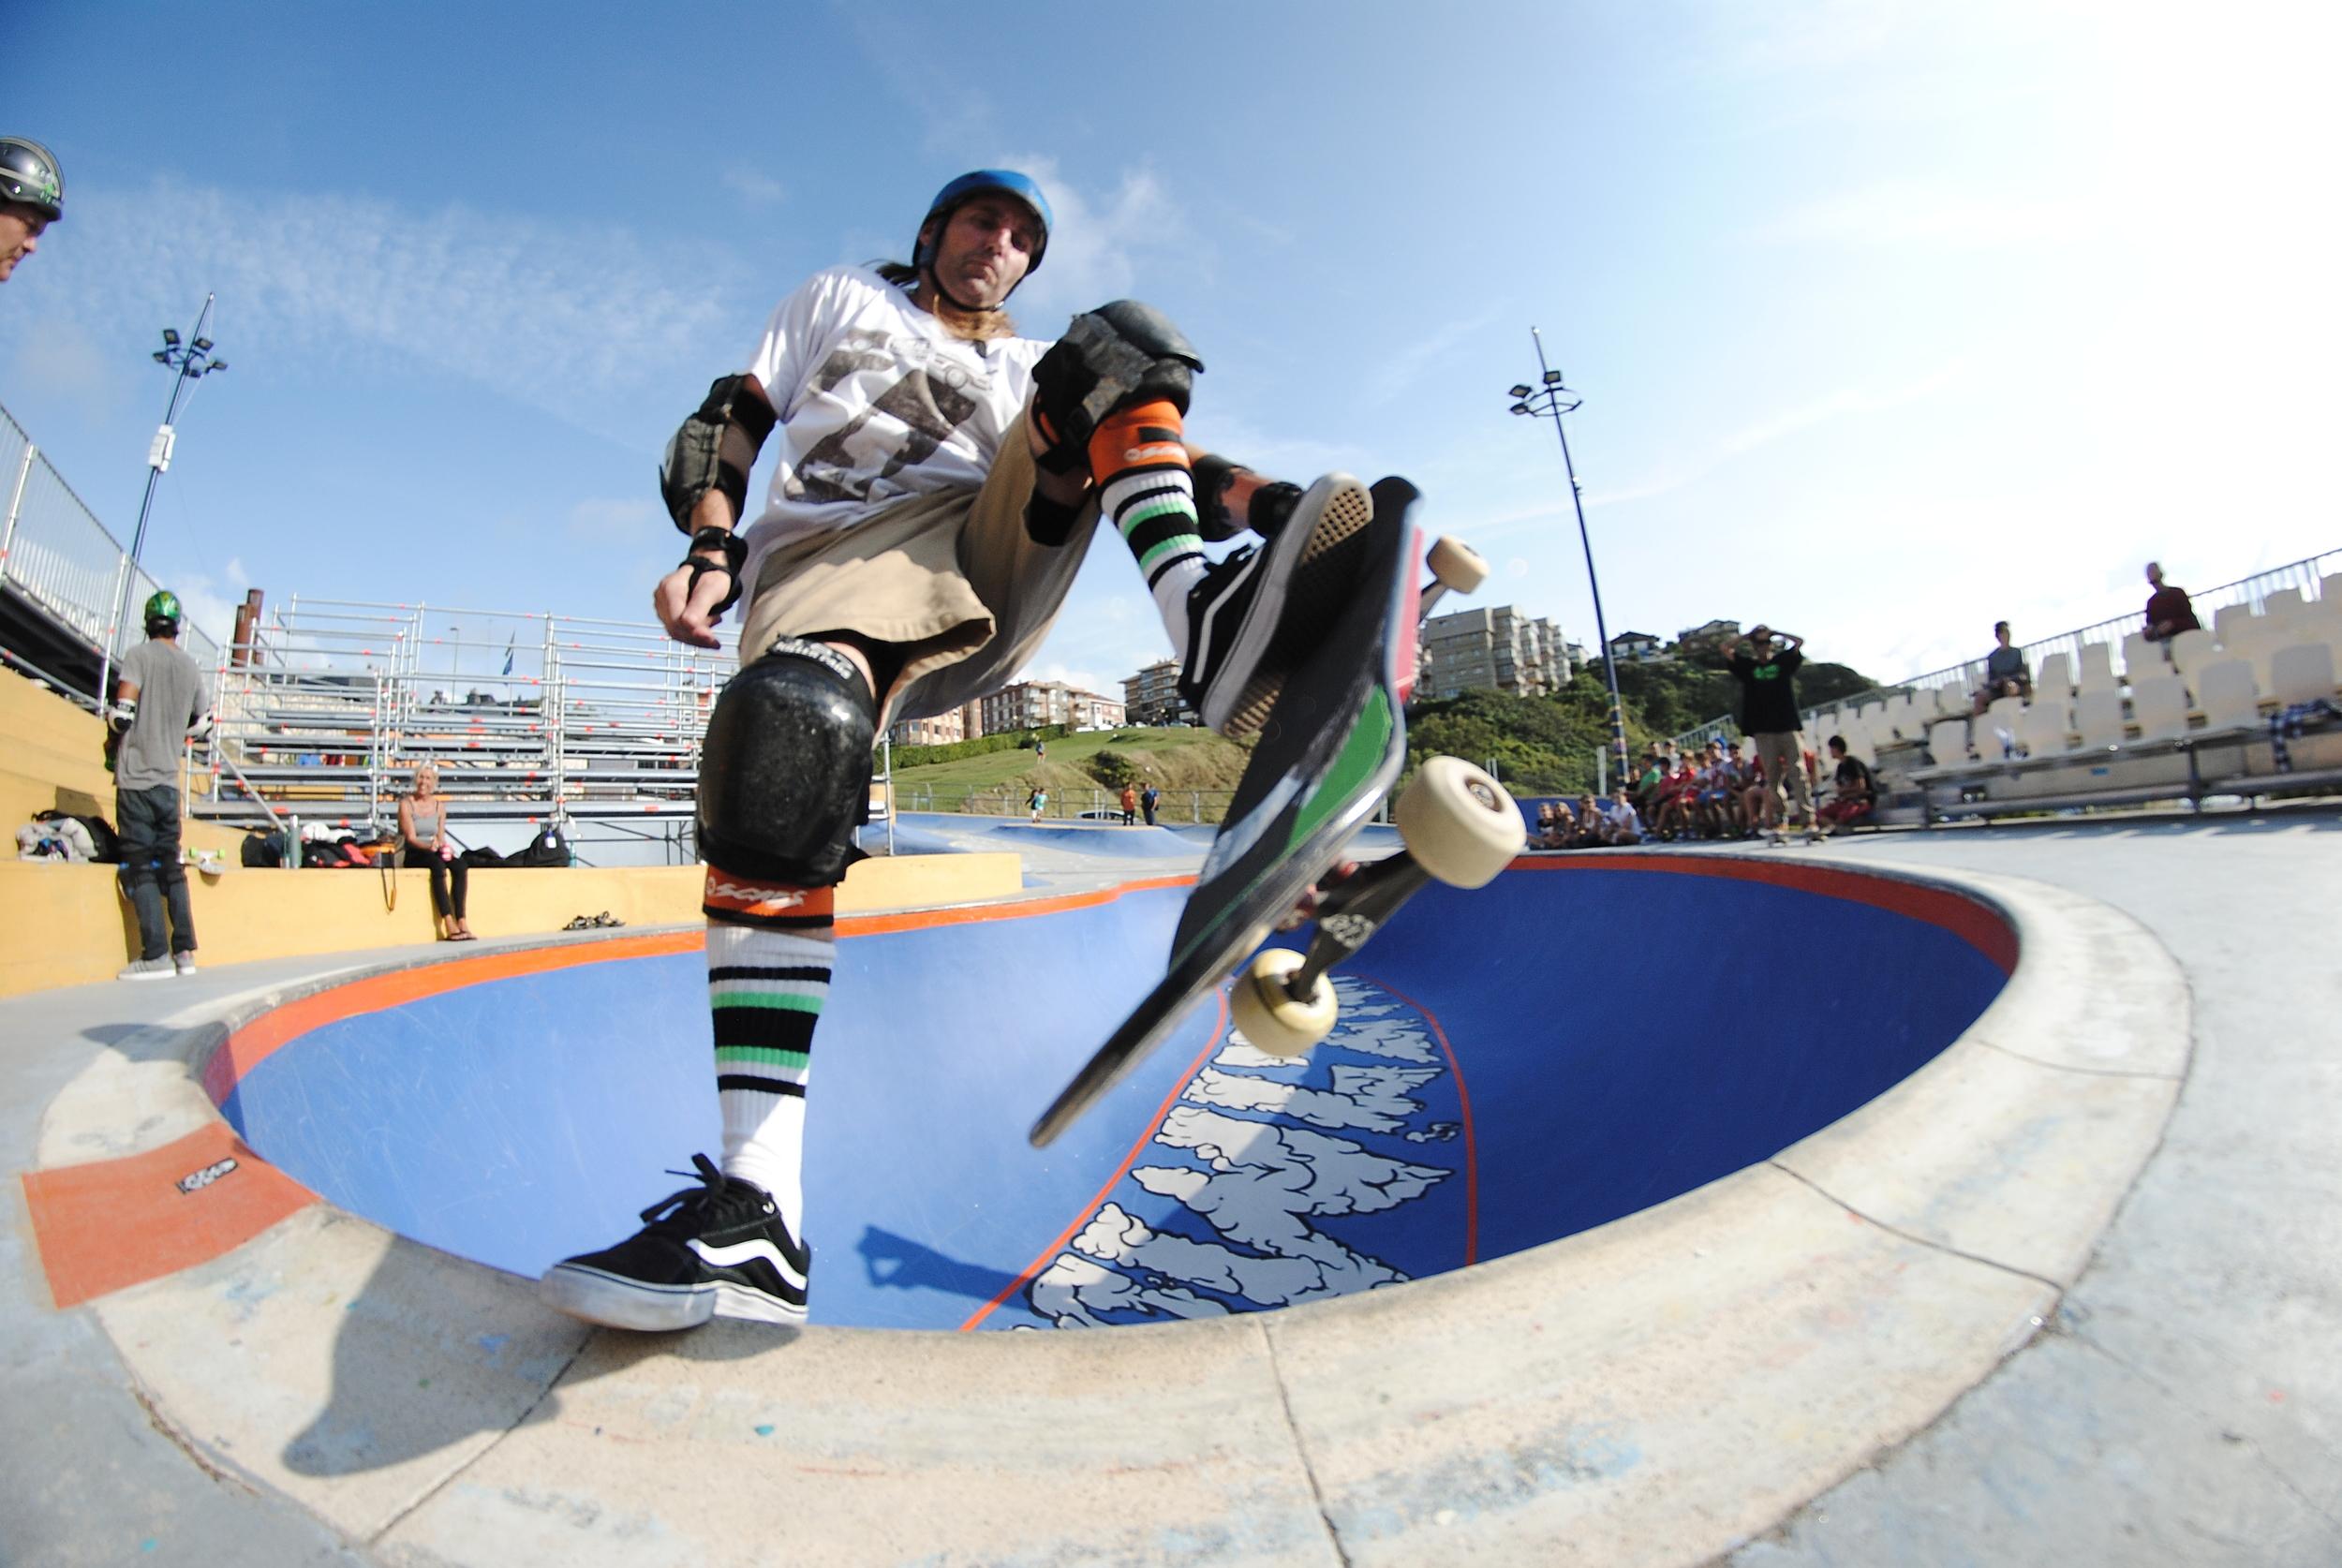 LaKantera-Bowl-Practice-SeanGoff-Photo BorjaCasas.JPG